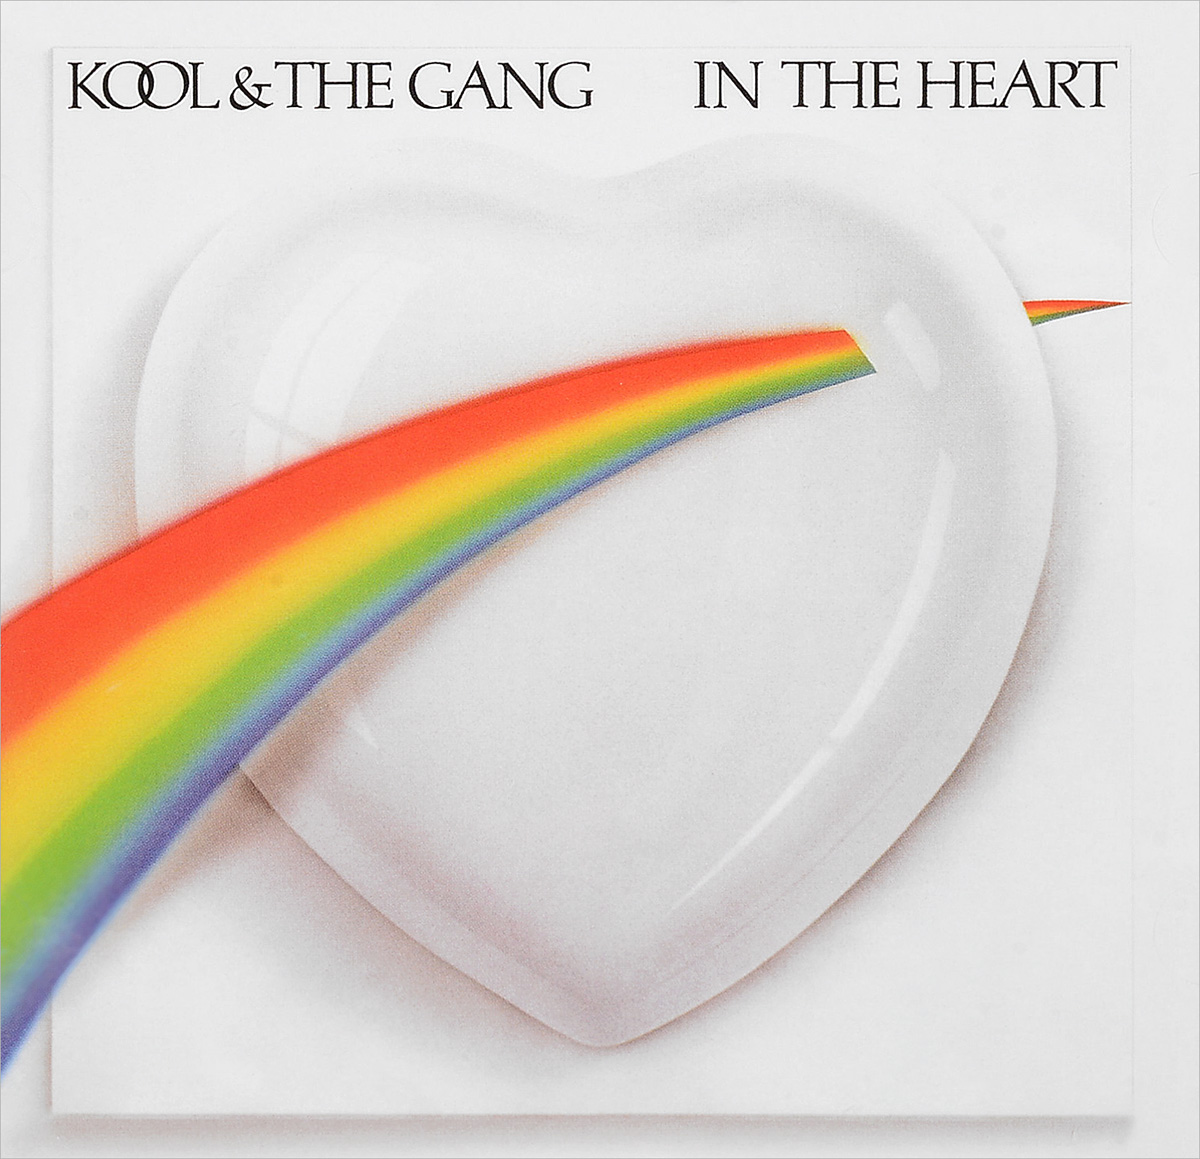 Kool & The Gang Kool & The Gang. In The Heart the magic gang the magic gang the magic gang